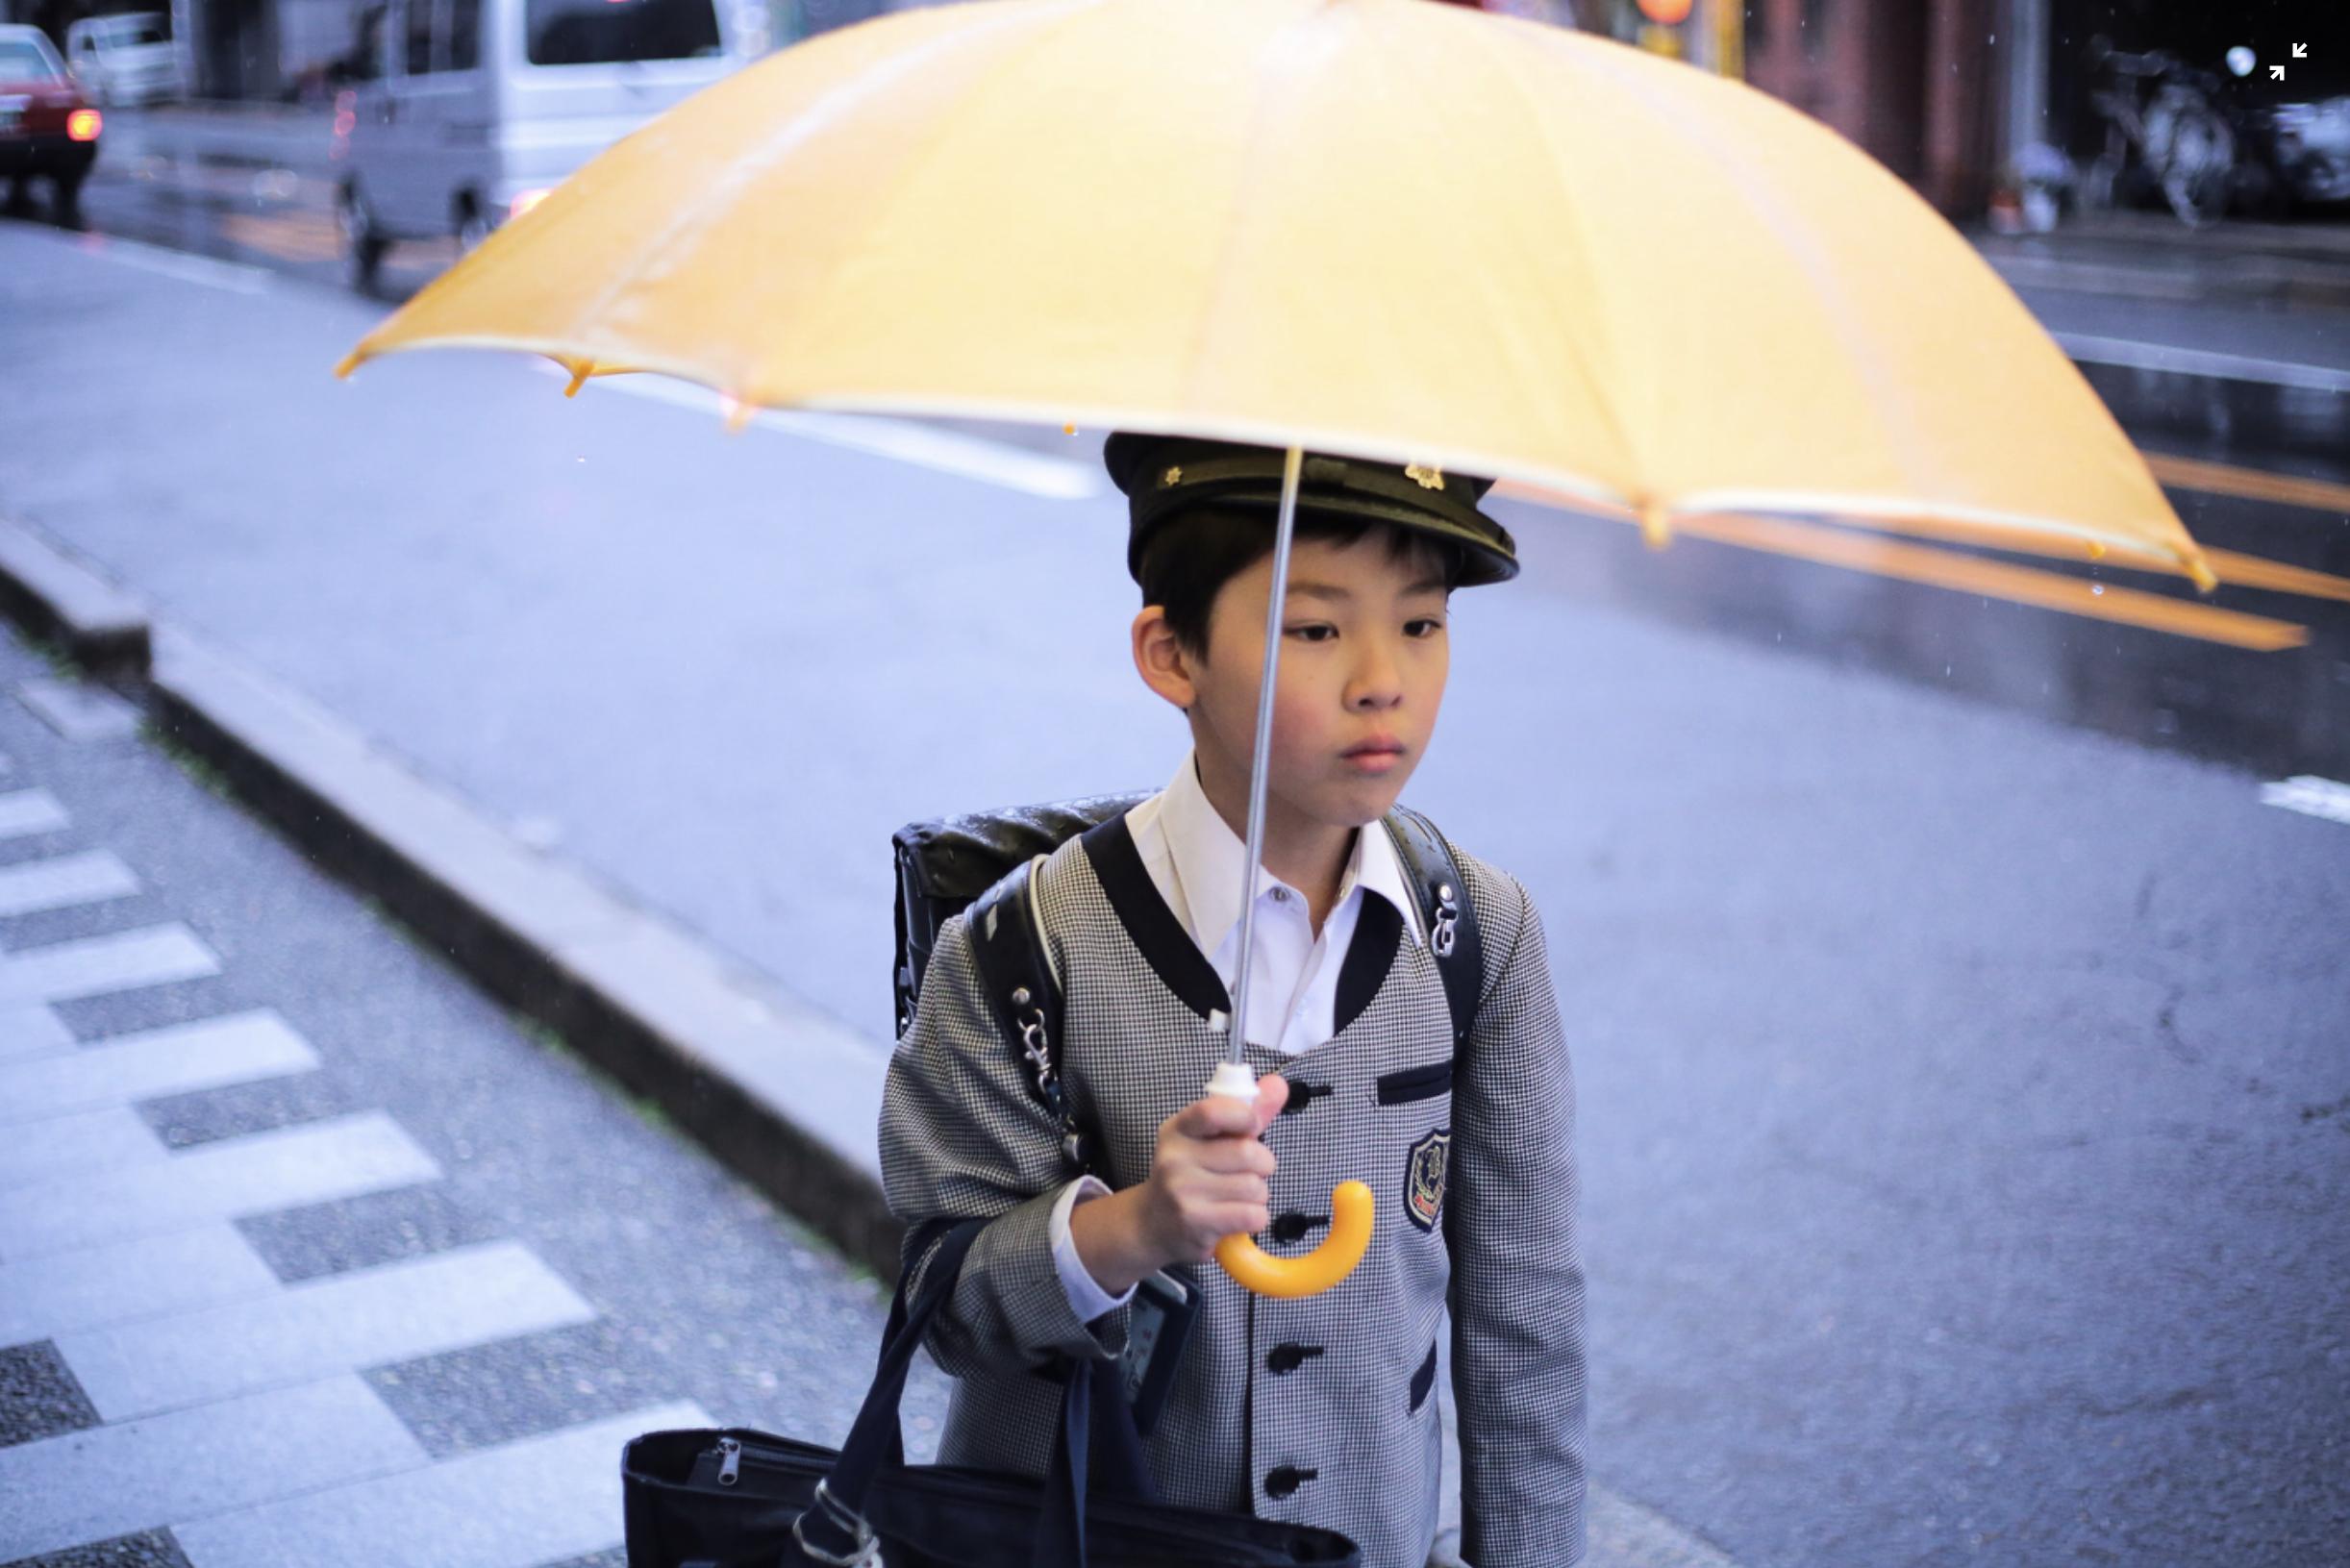 Japanese Boy - Kyoto Prefecture